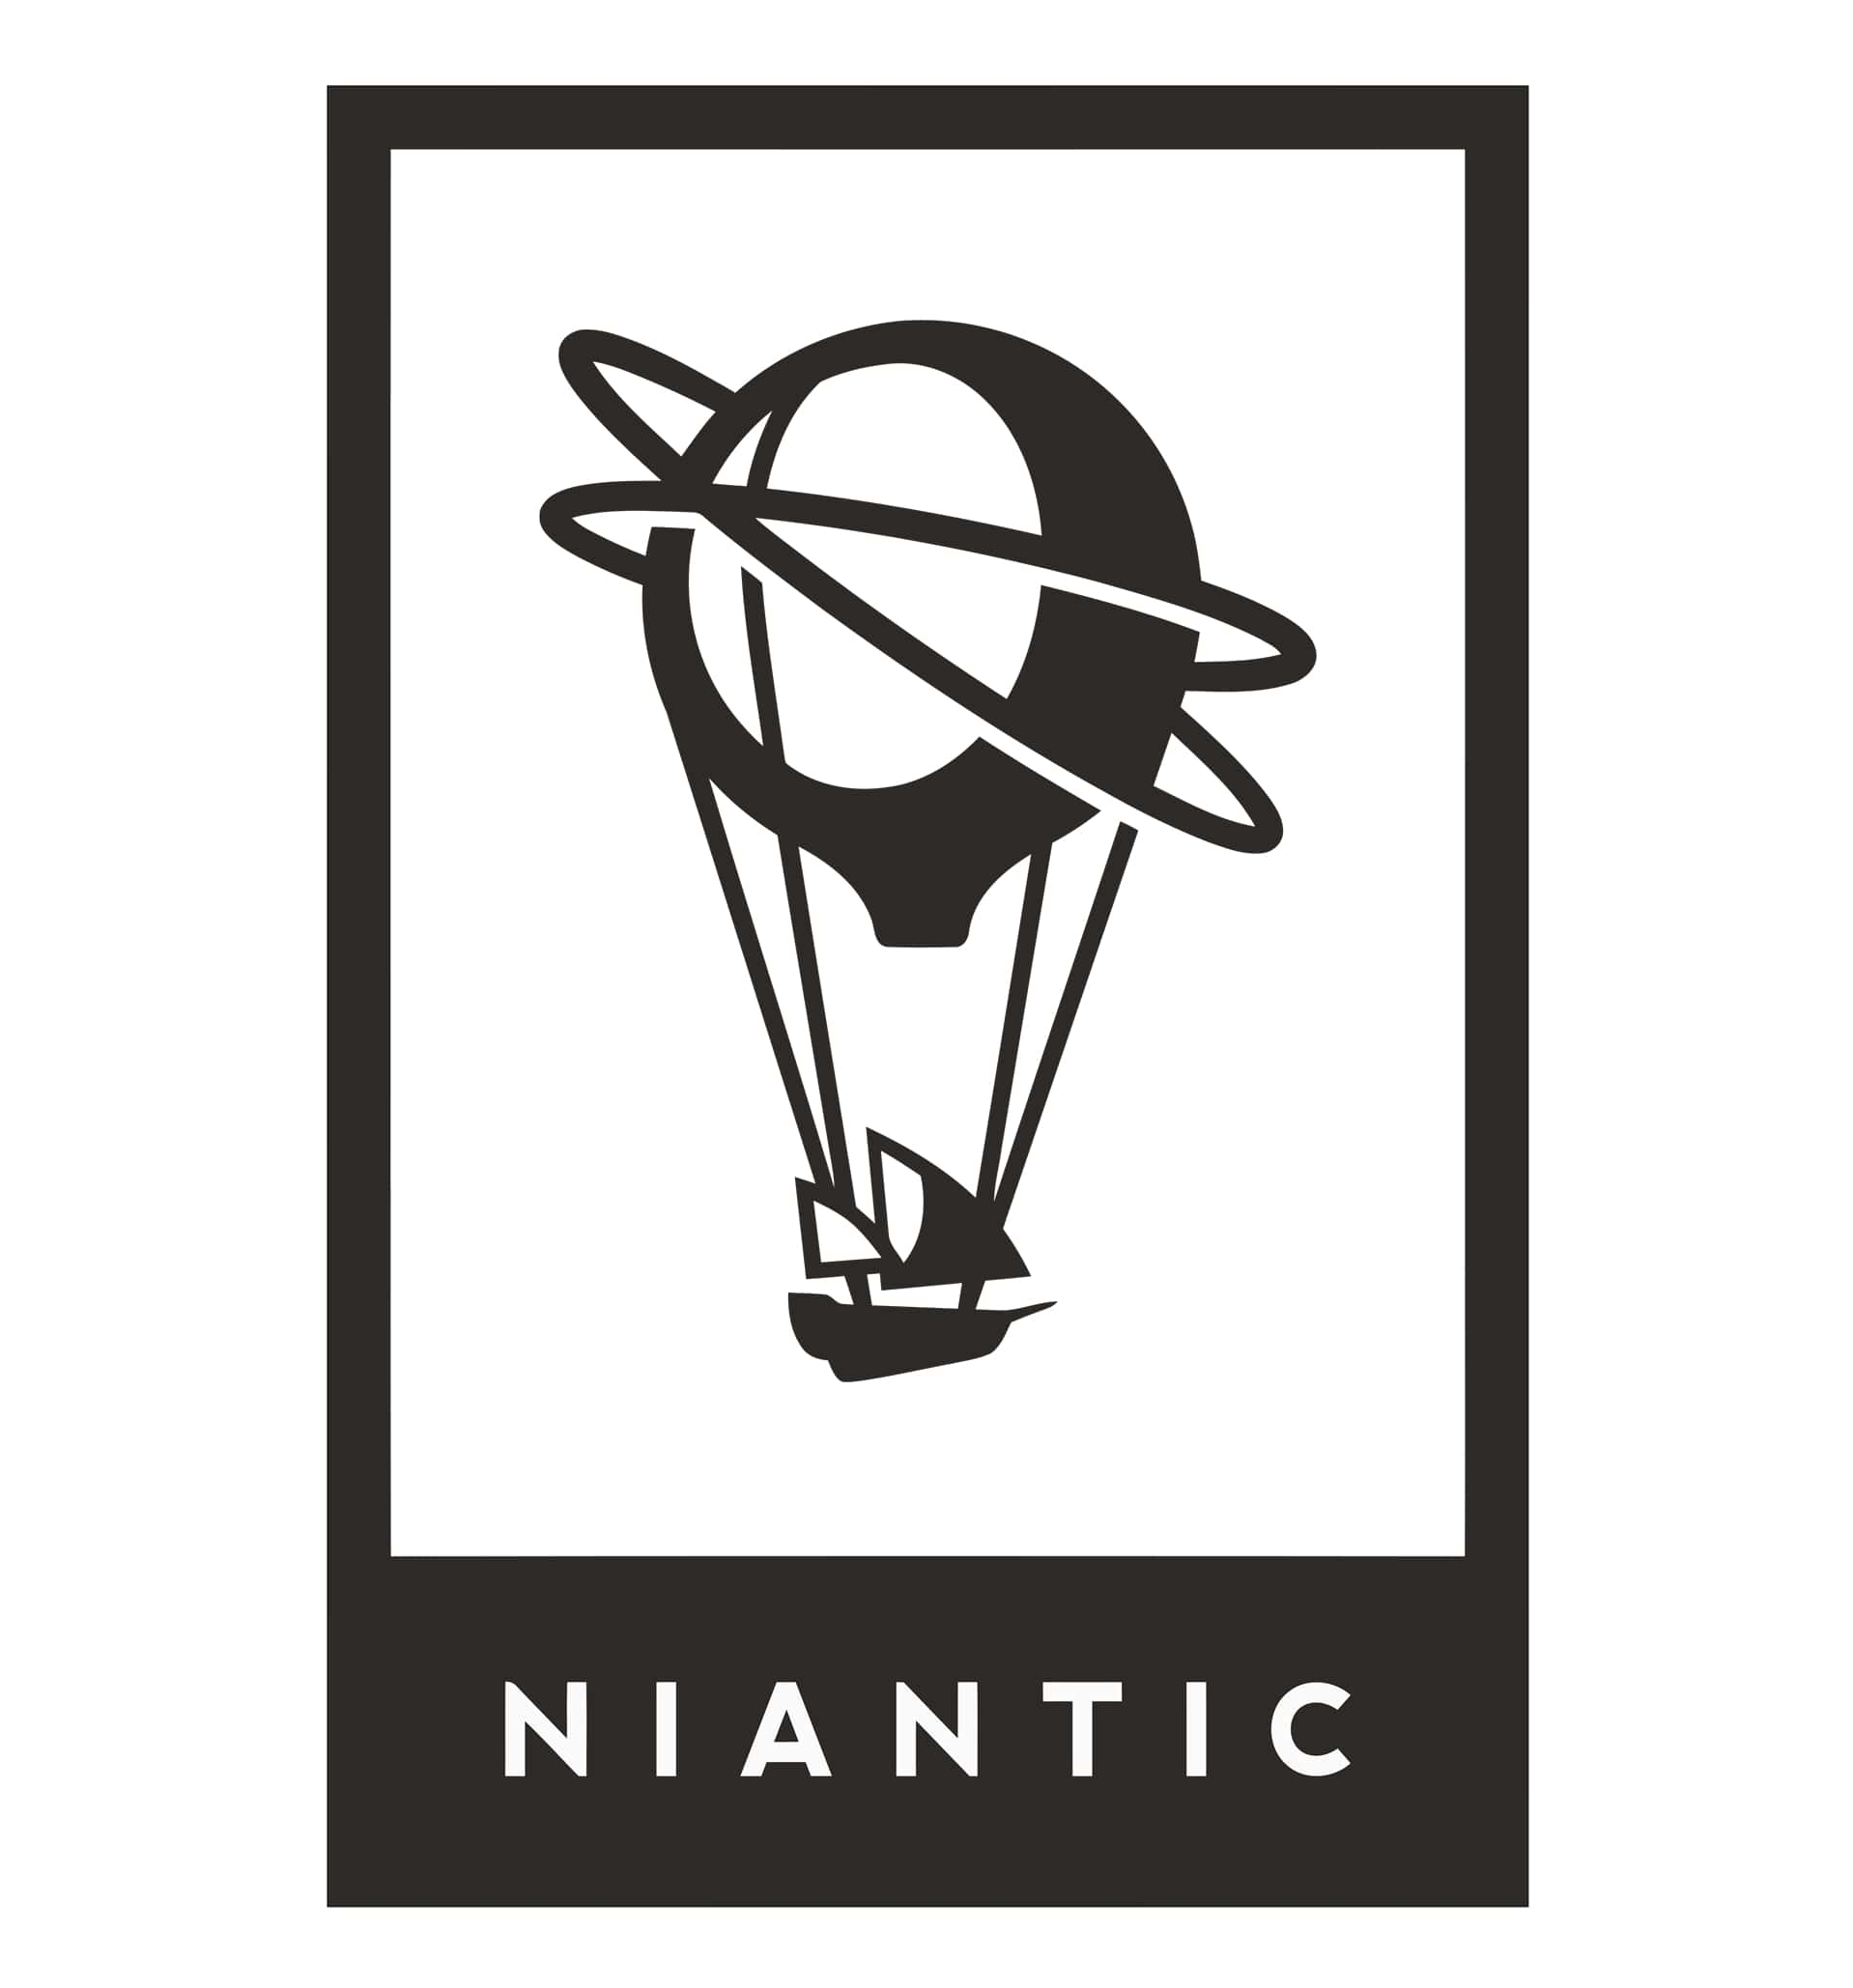 Niantic_Labs_logo.jpg